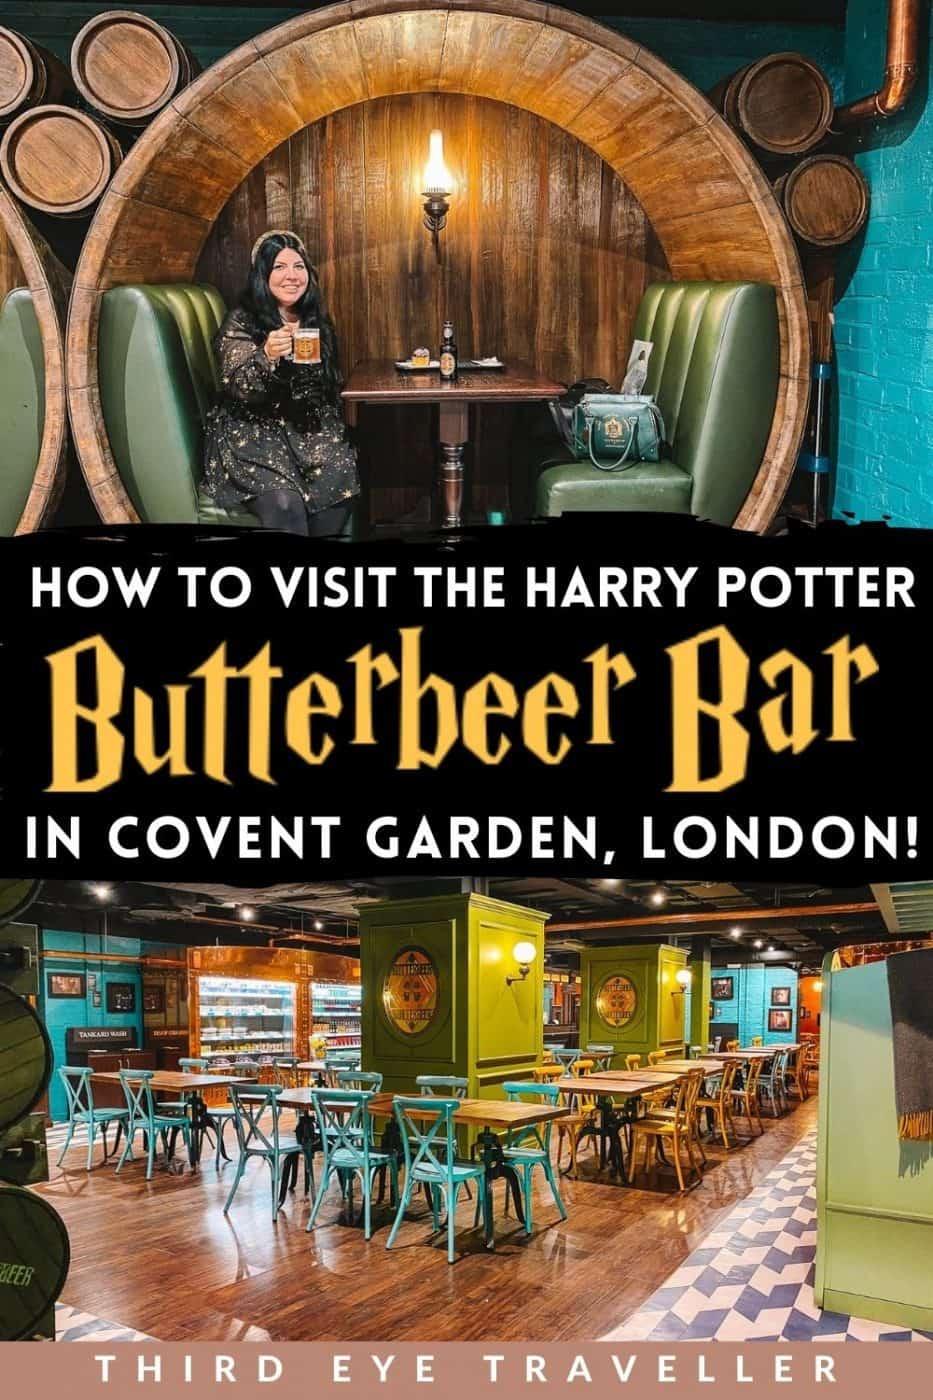 Harry Potter Butterbeer Bar in London